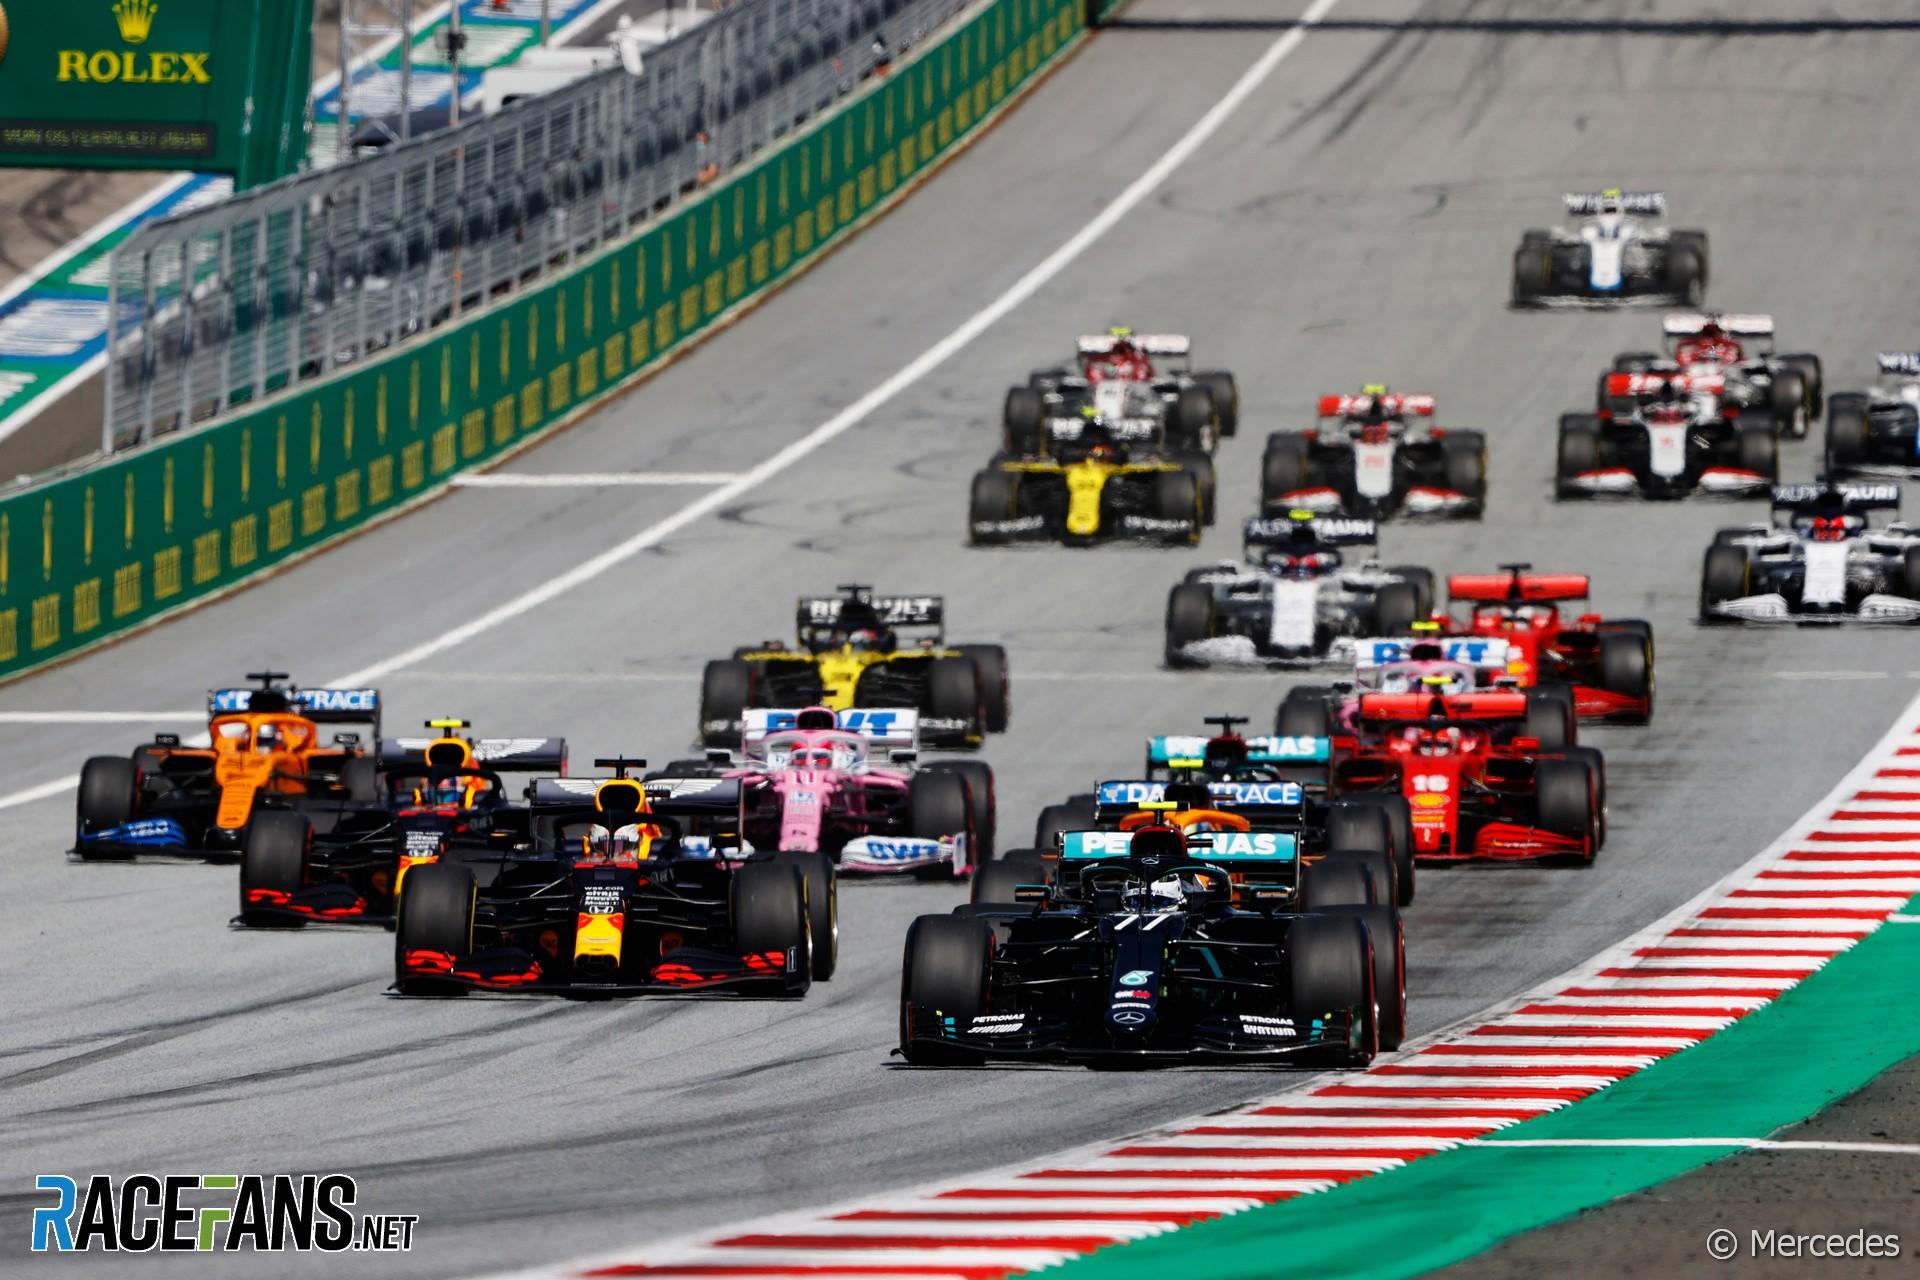 2020 F1 Calendar Formula 1 Grand Prix Schedule Details Racefans